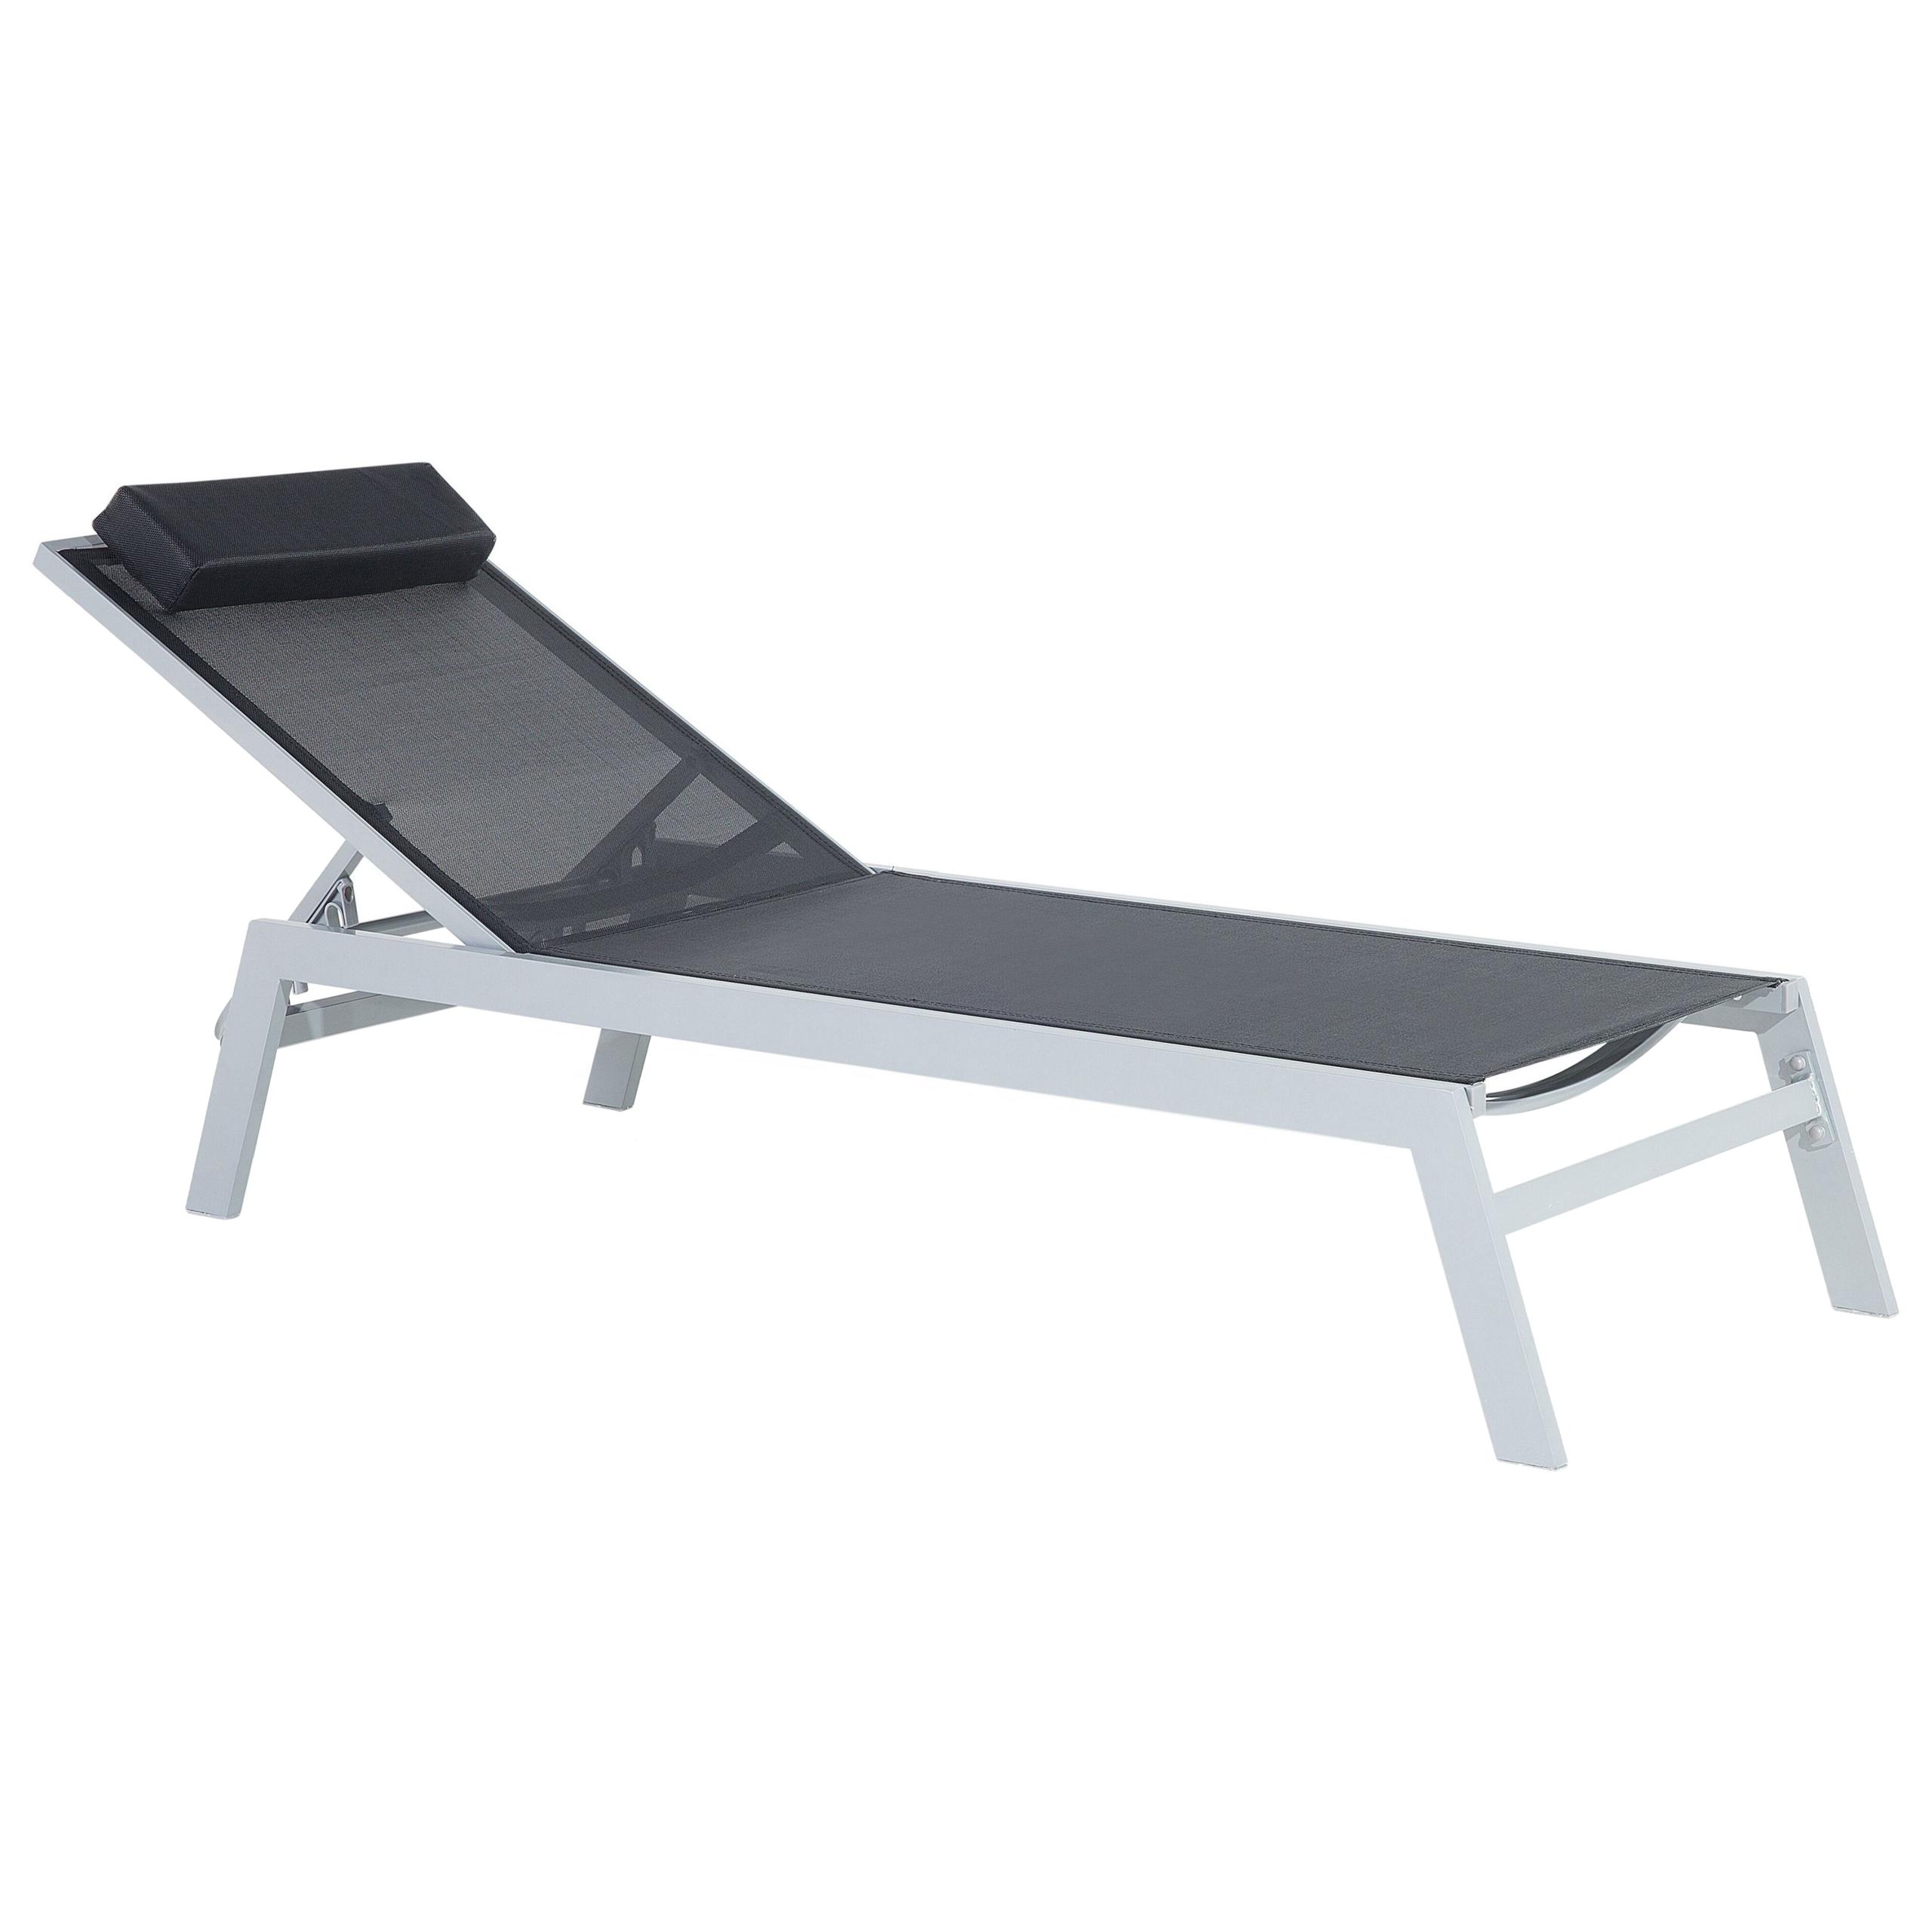 Beliani Garden Outdoor Lounger Black Textile Seat Aluminium Frame Headrest Cushion Adjustable Reclining Backrest